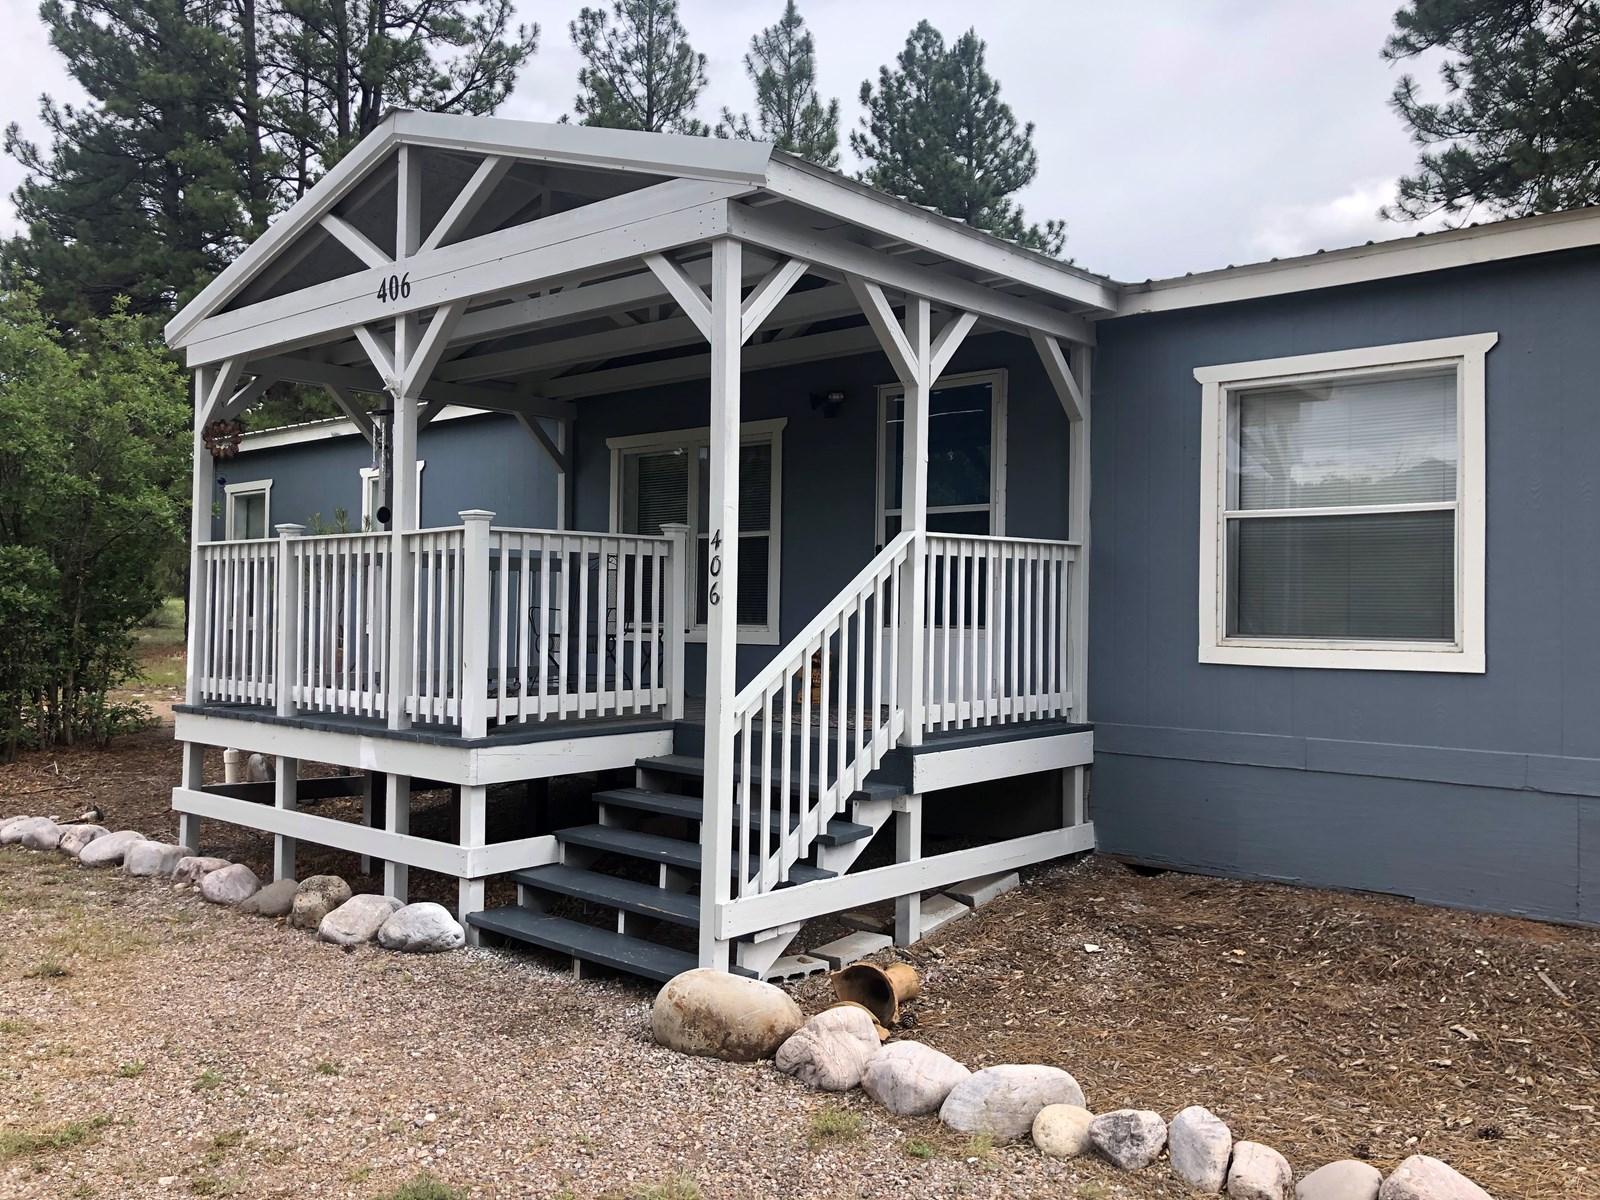 Mountain Retreat or Permanent Residence near Brazos Cliffs